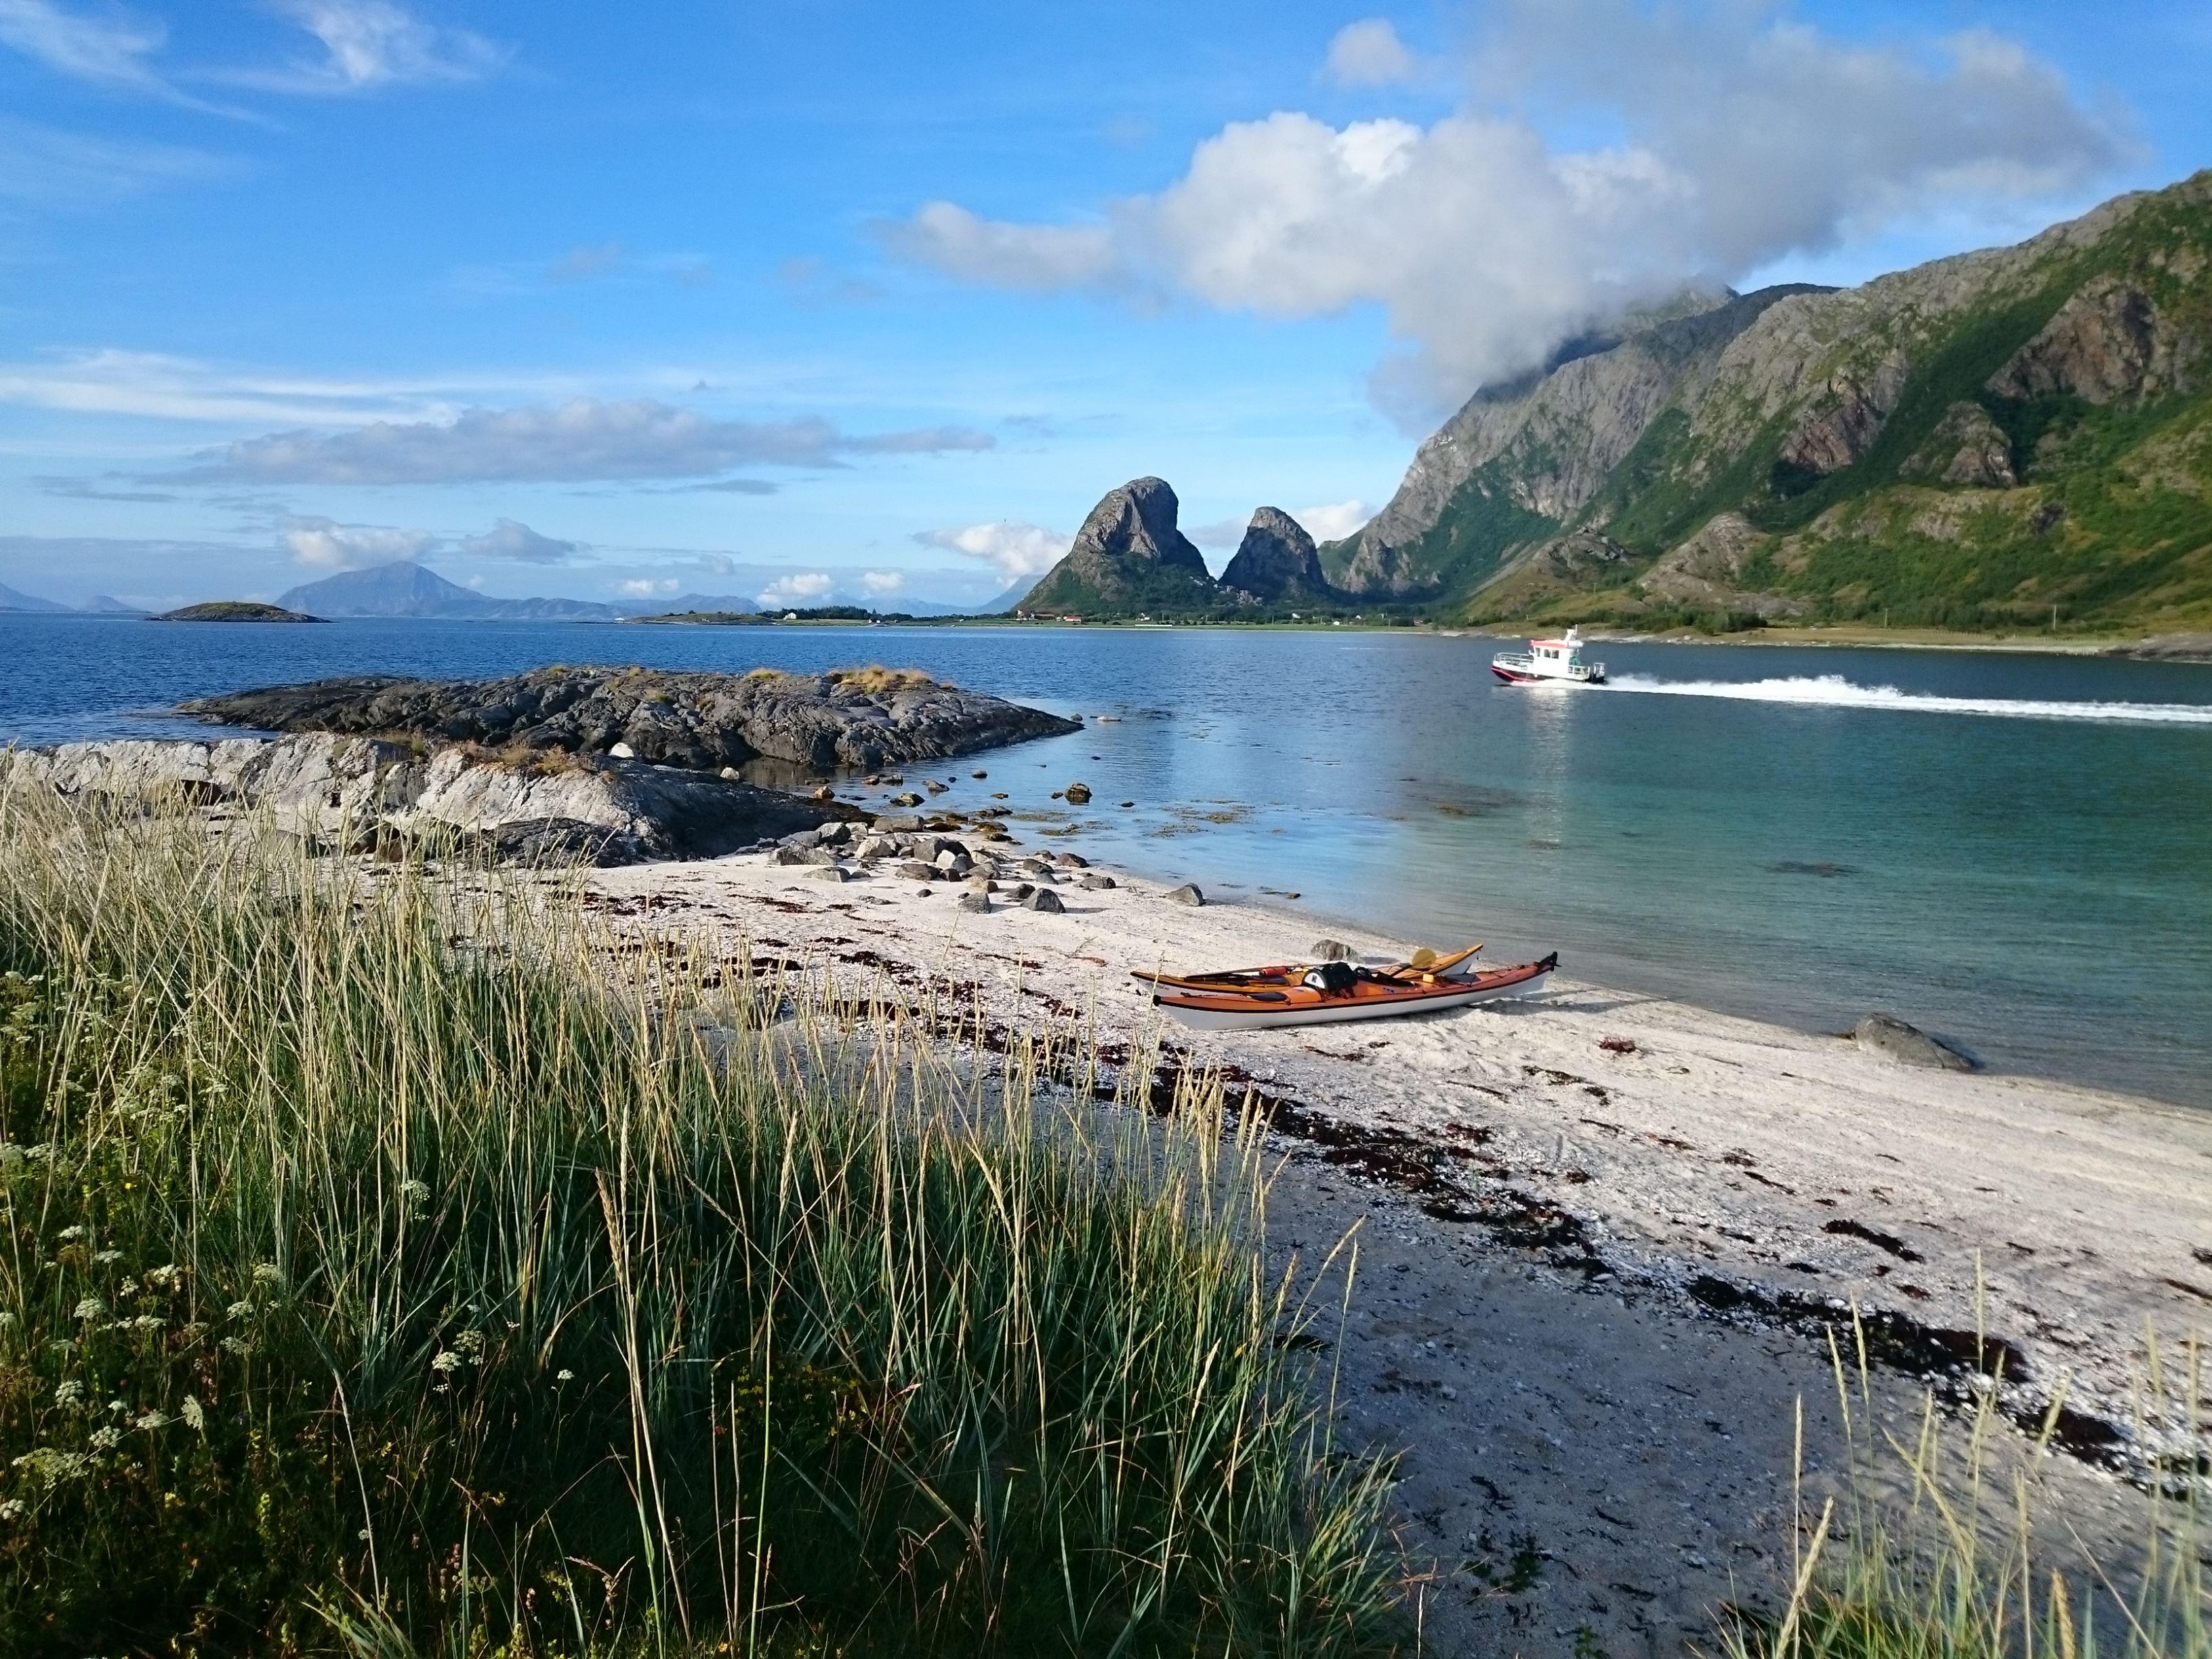 Helgeland Kayak - Kayak Courses on the fairytale island Tomma